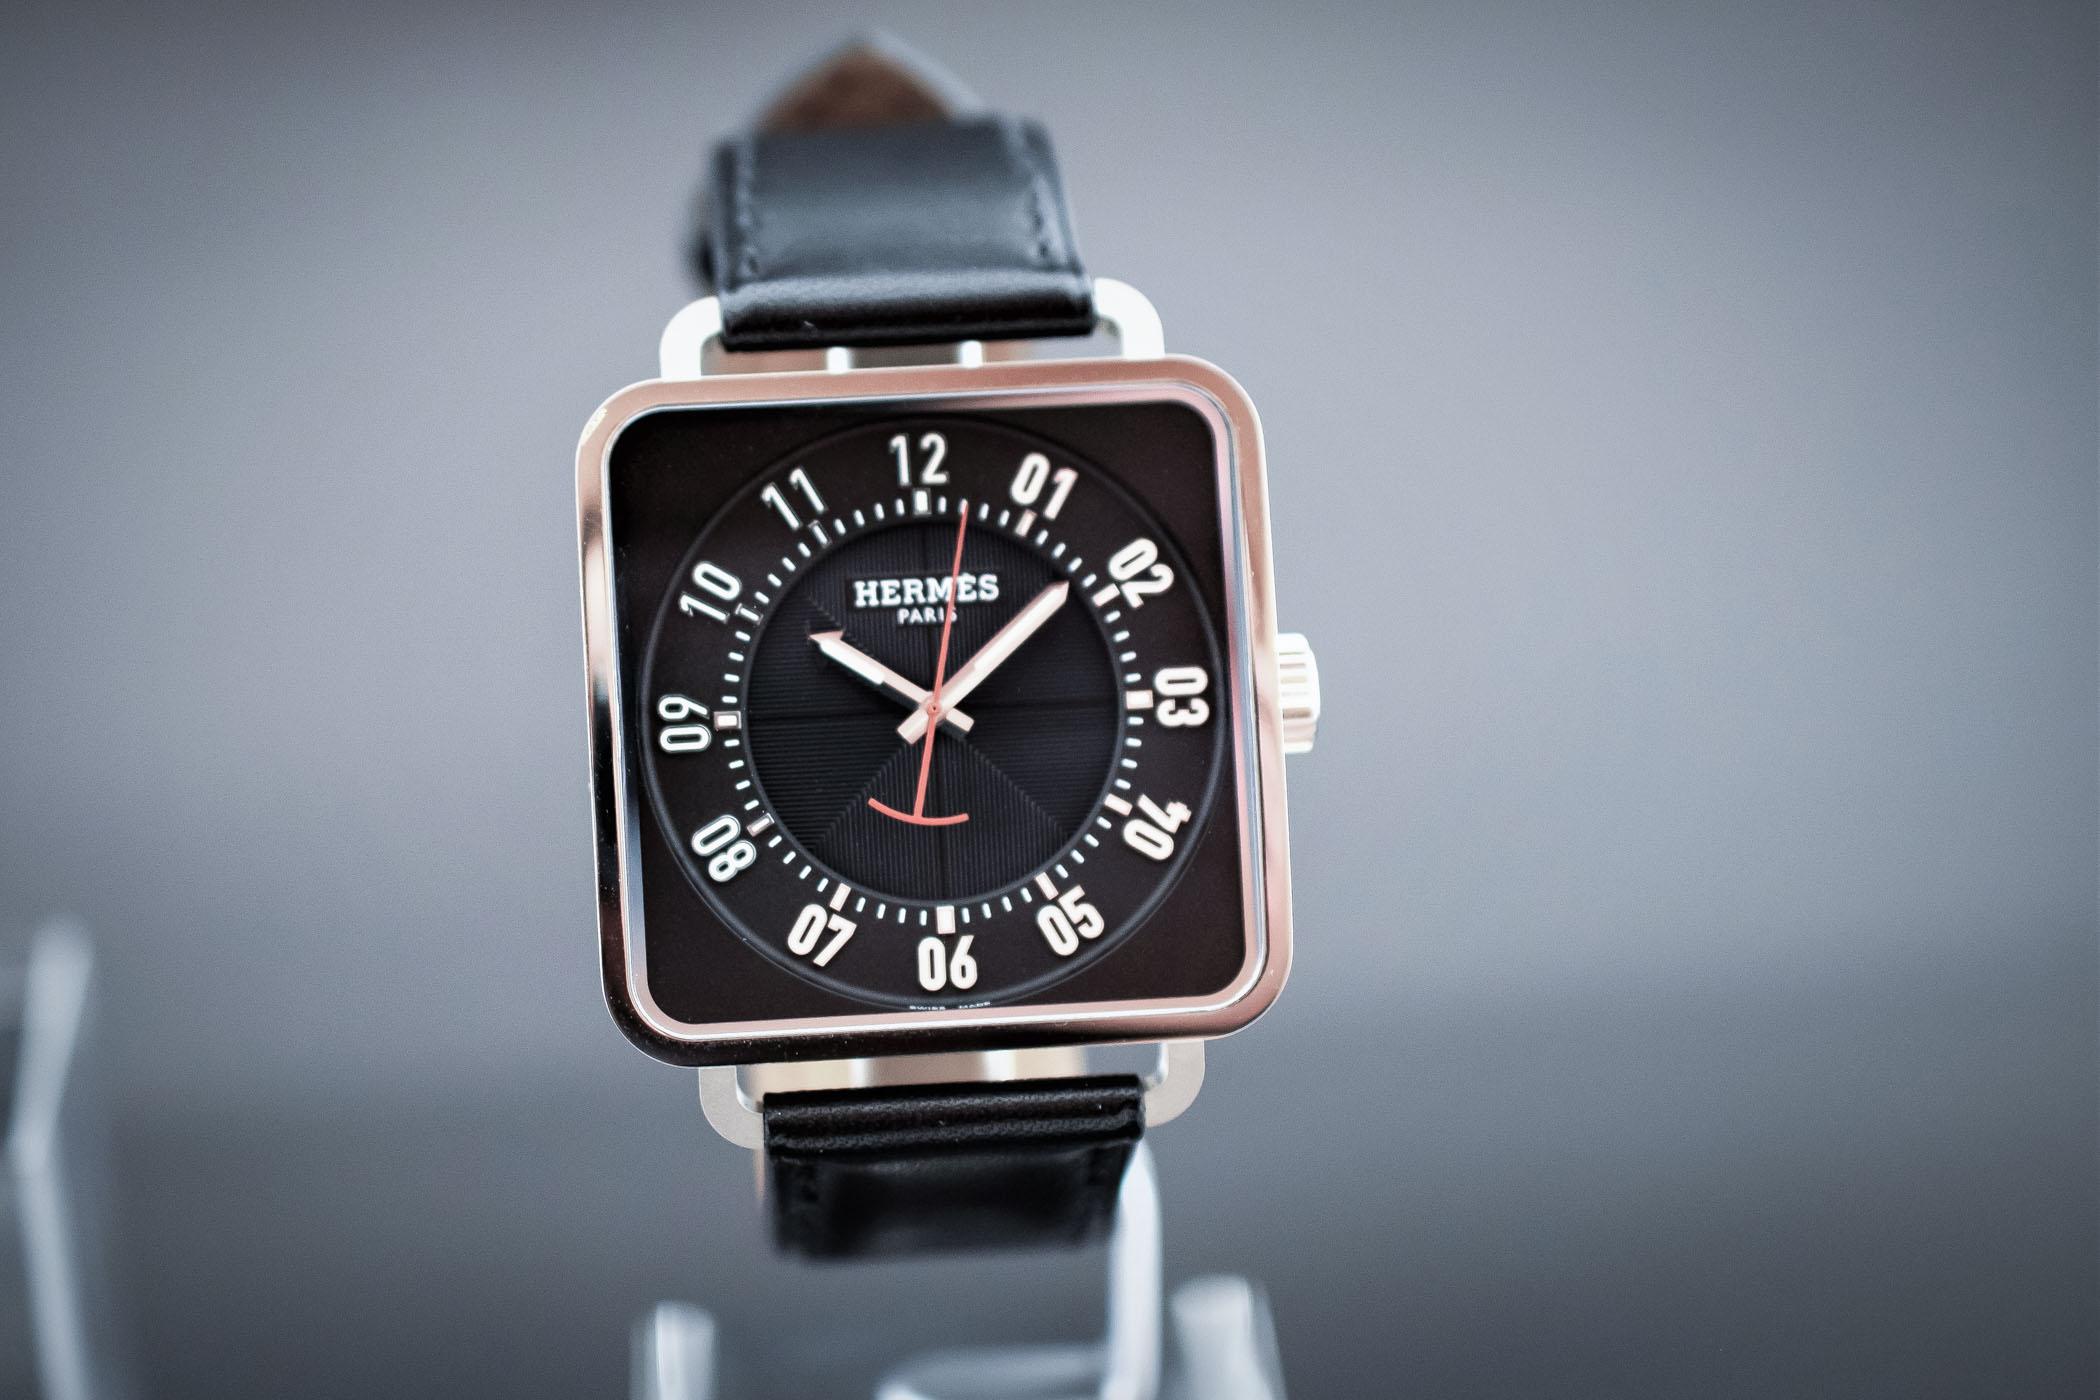 Hermès Carré H Watch Design by Marc Berthier - SIHH 2018 Hands-On ... e98d79cd96a36